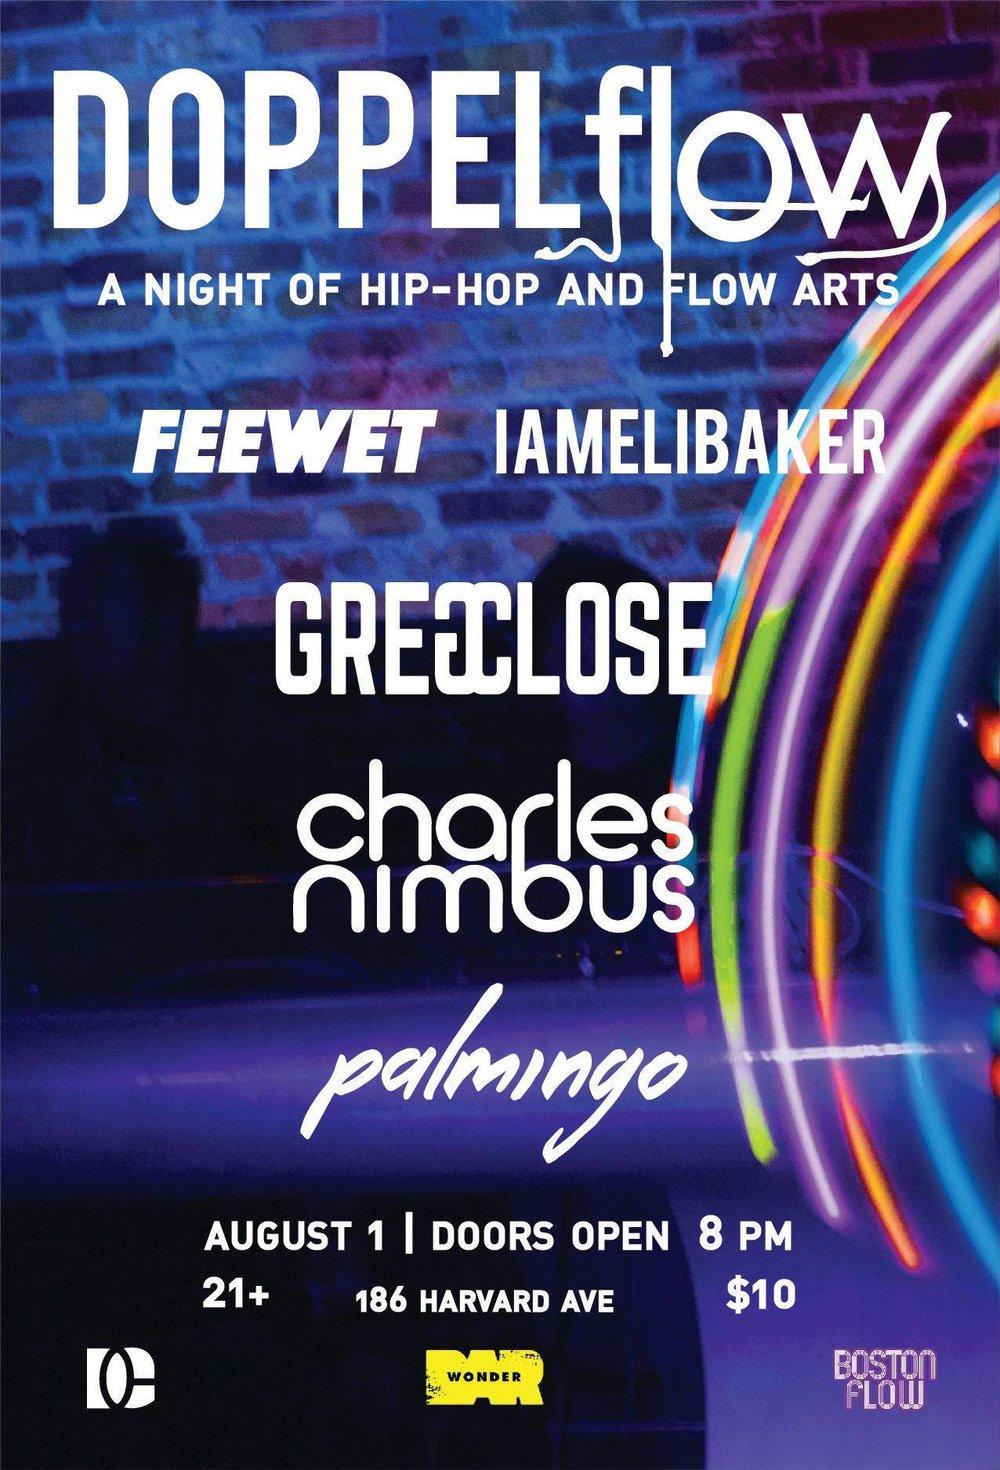 Tuesday August 1st   at Wonder Bar DoppleFllow  $10 presale / $12 door / 21+ Music by feewet, iamelibaker, Charles Nimbus, Greg Close, and Palmingo Flow performances by Boston Flow